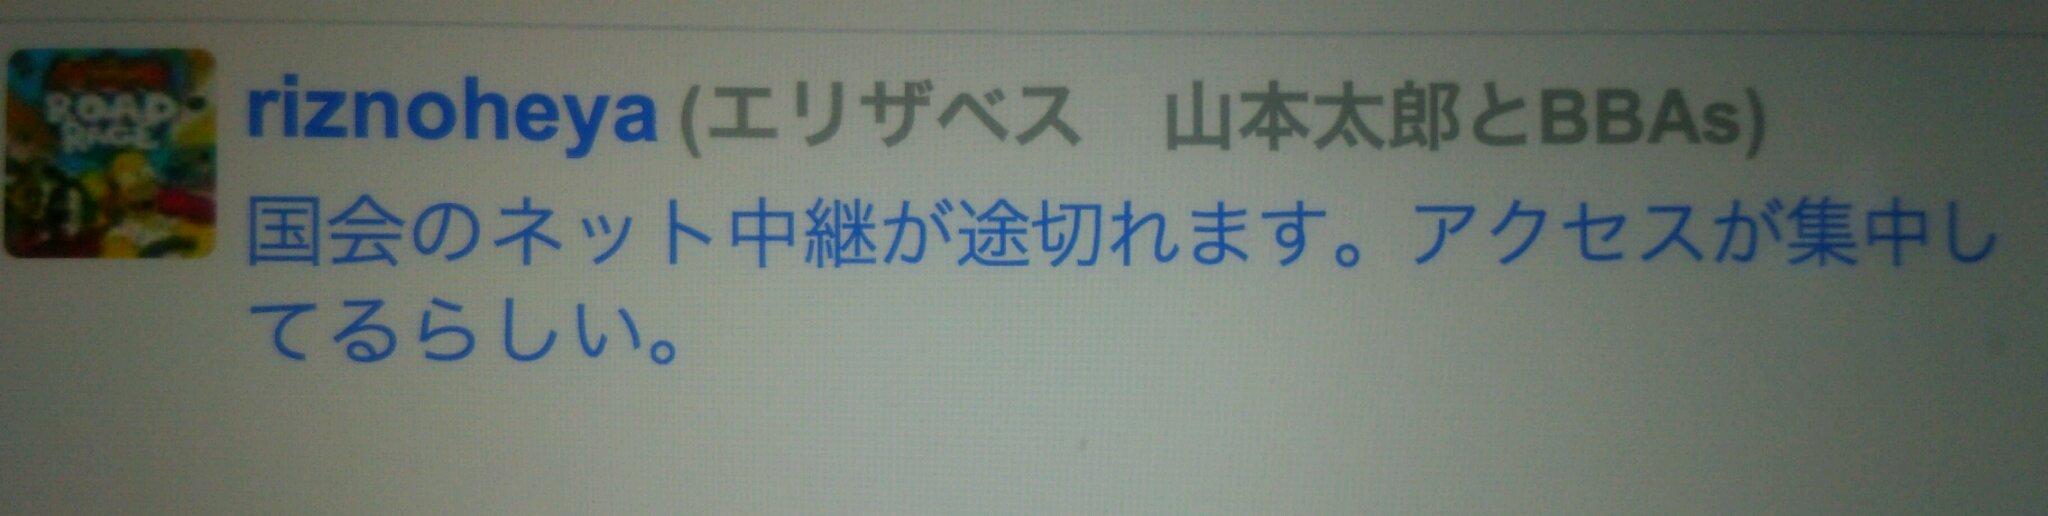 c0325437_18553935.jpg